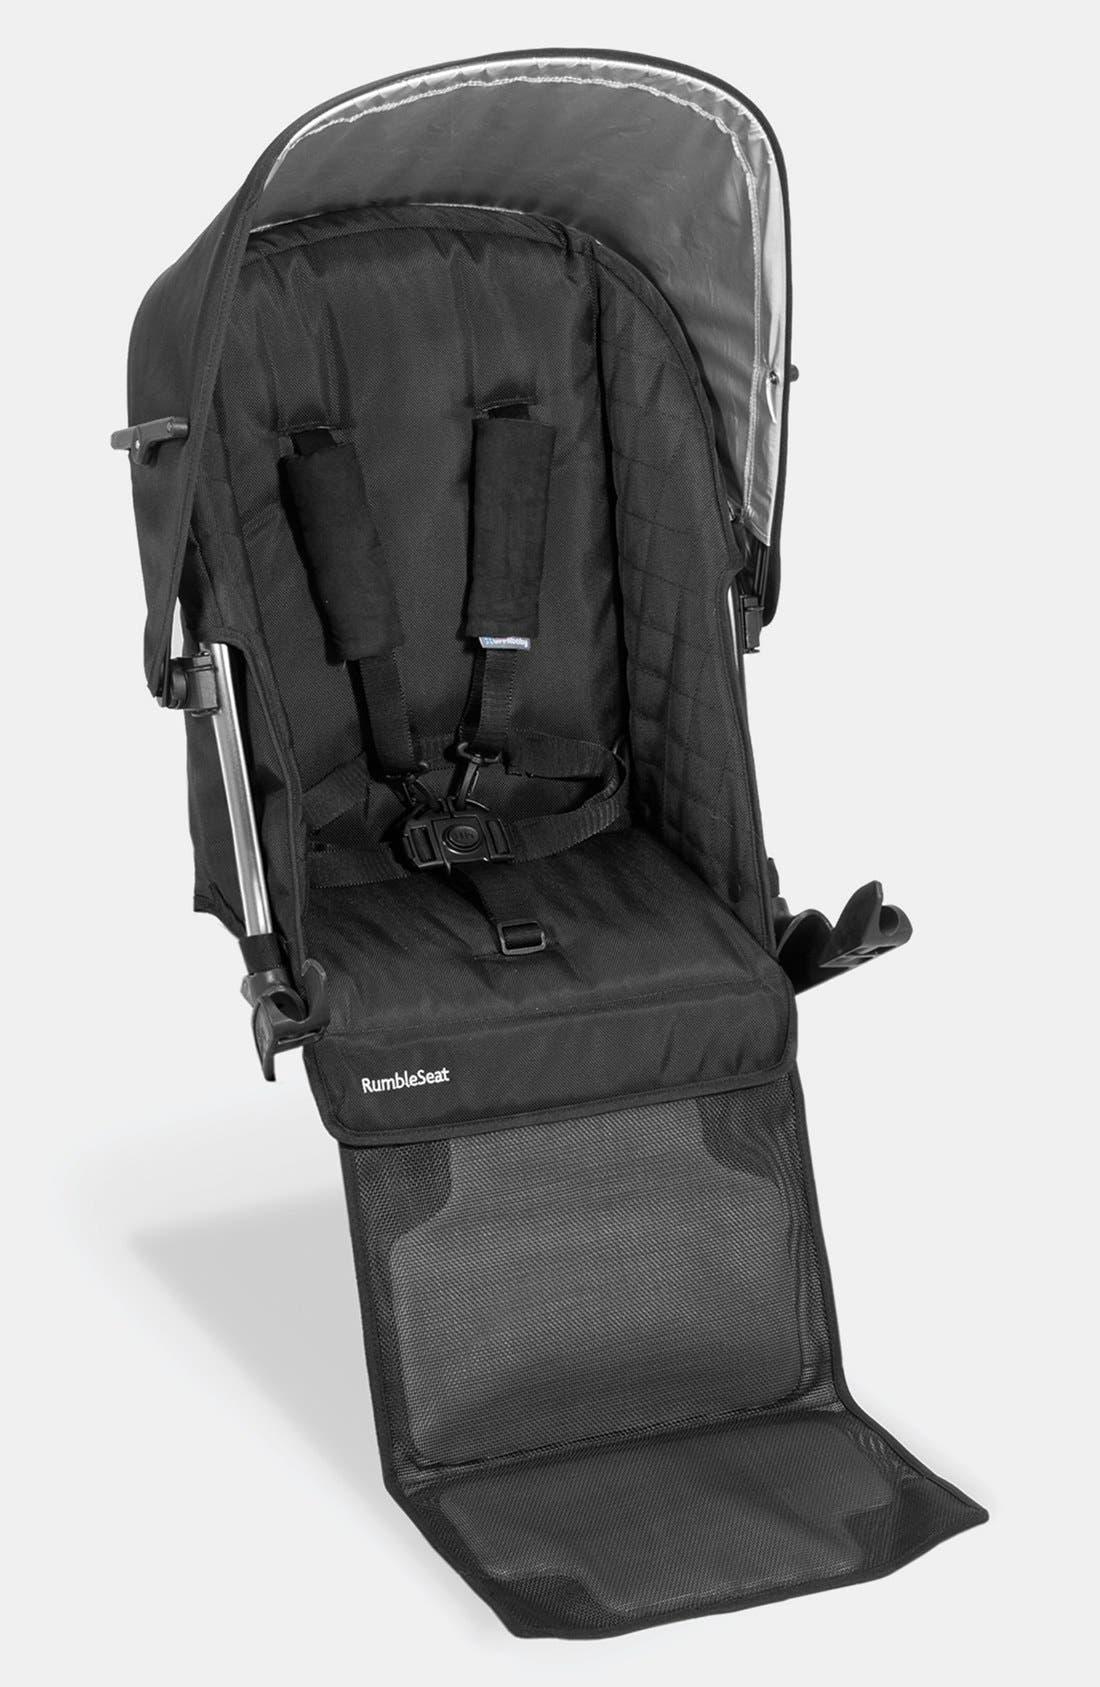 Main Image - UPPAbaby VISTA Stroller Rumble Seat